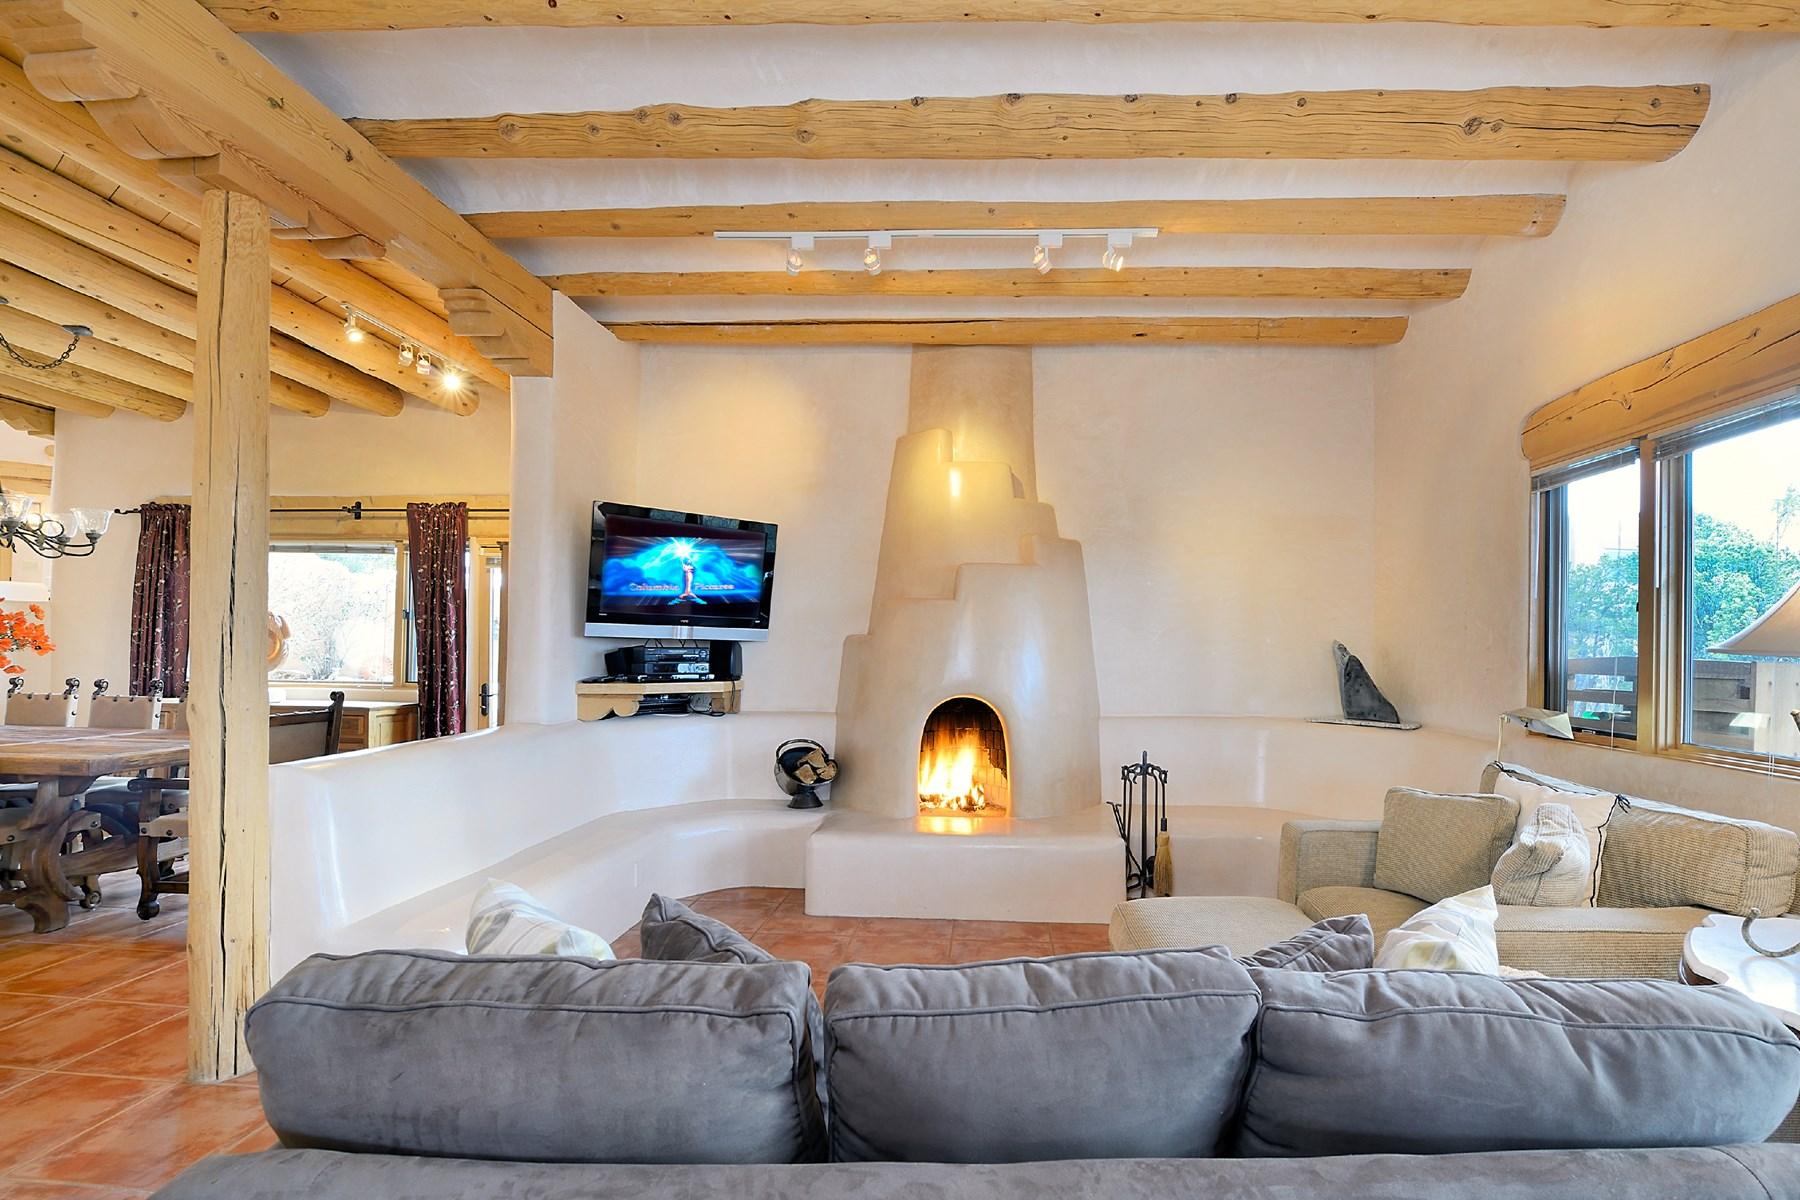 Single Family Home for Sale at 806 Paseo de la Cuma Santa Fe, New Mexico, 87501 United States